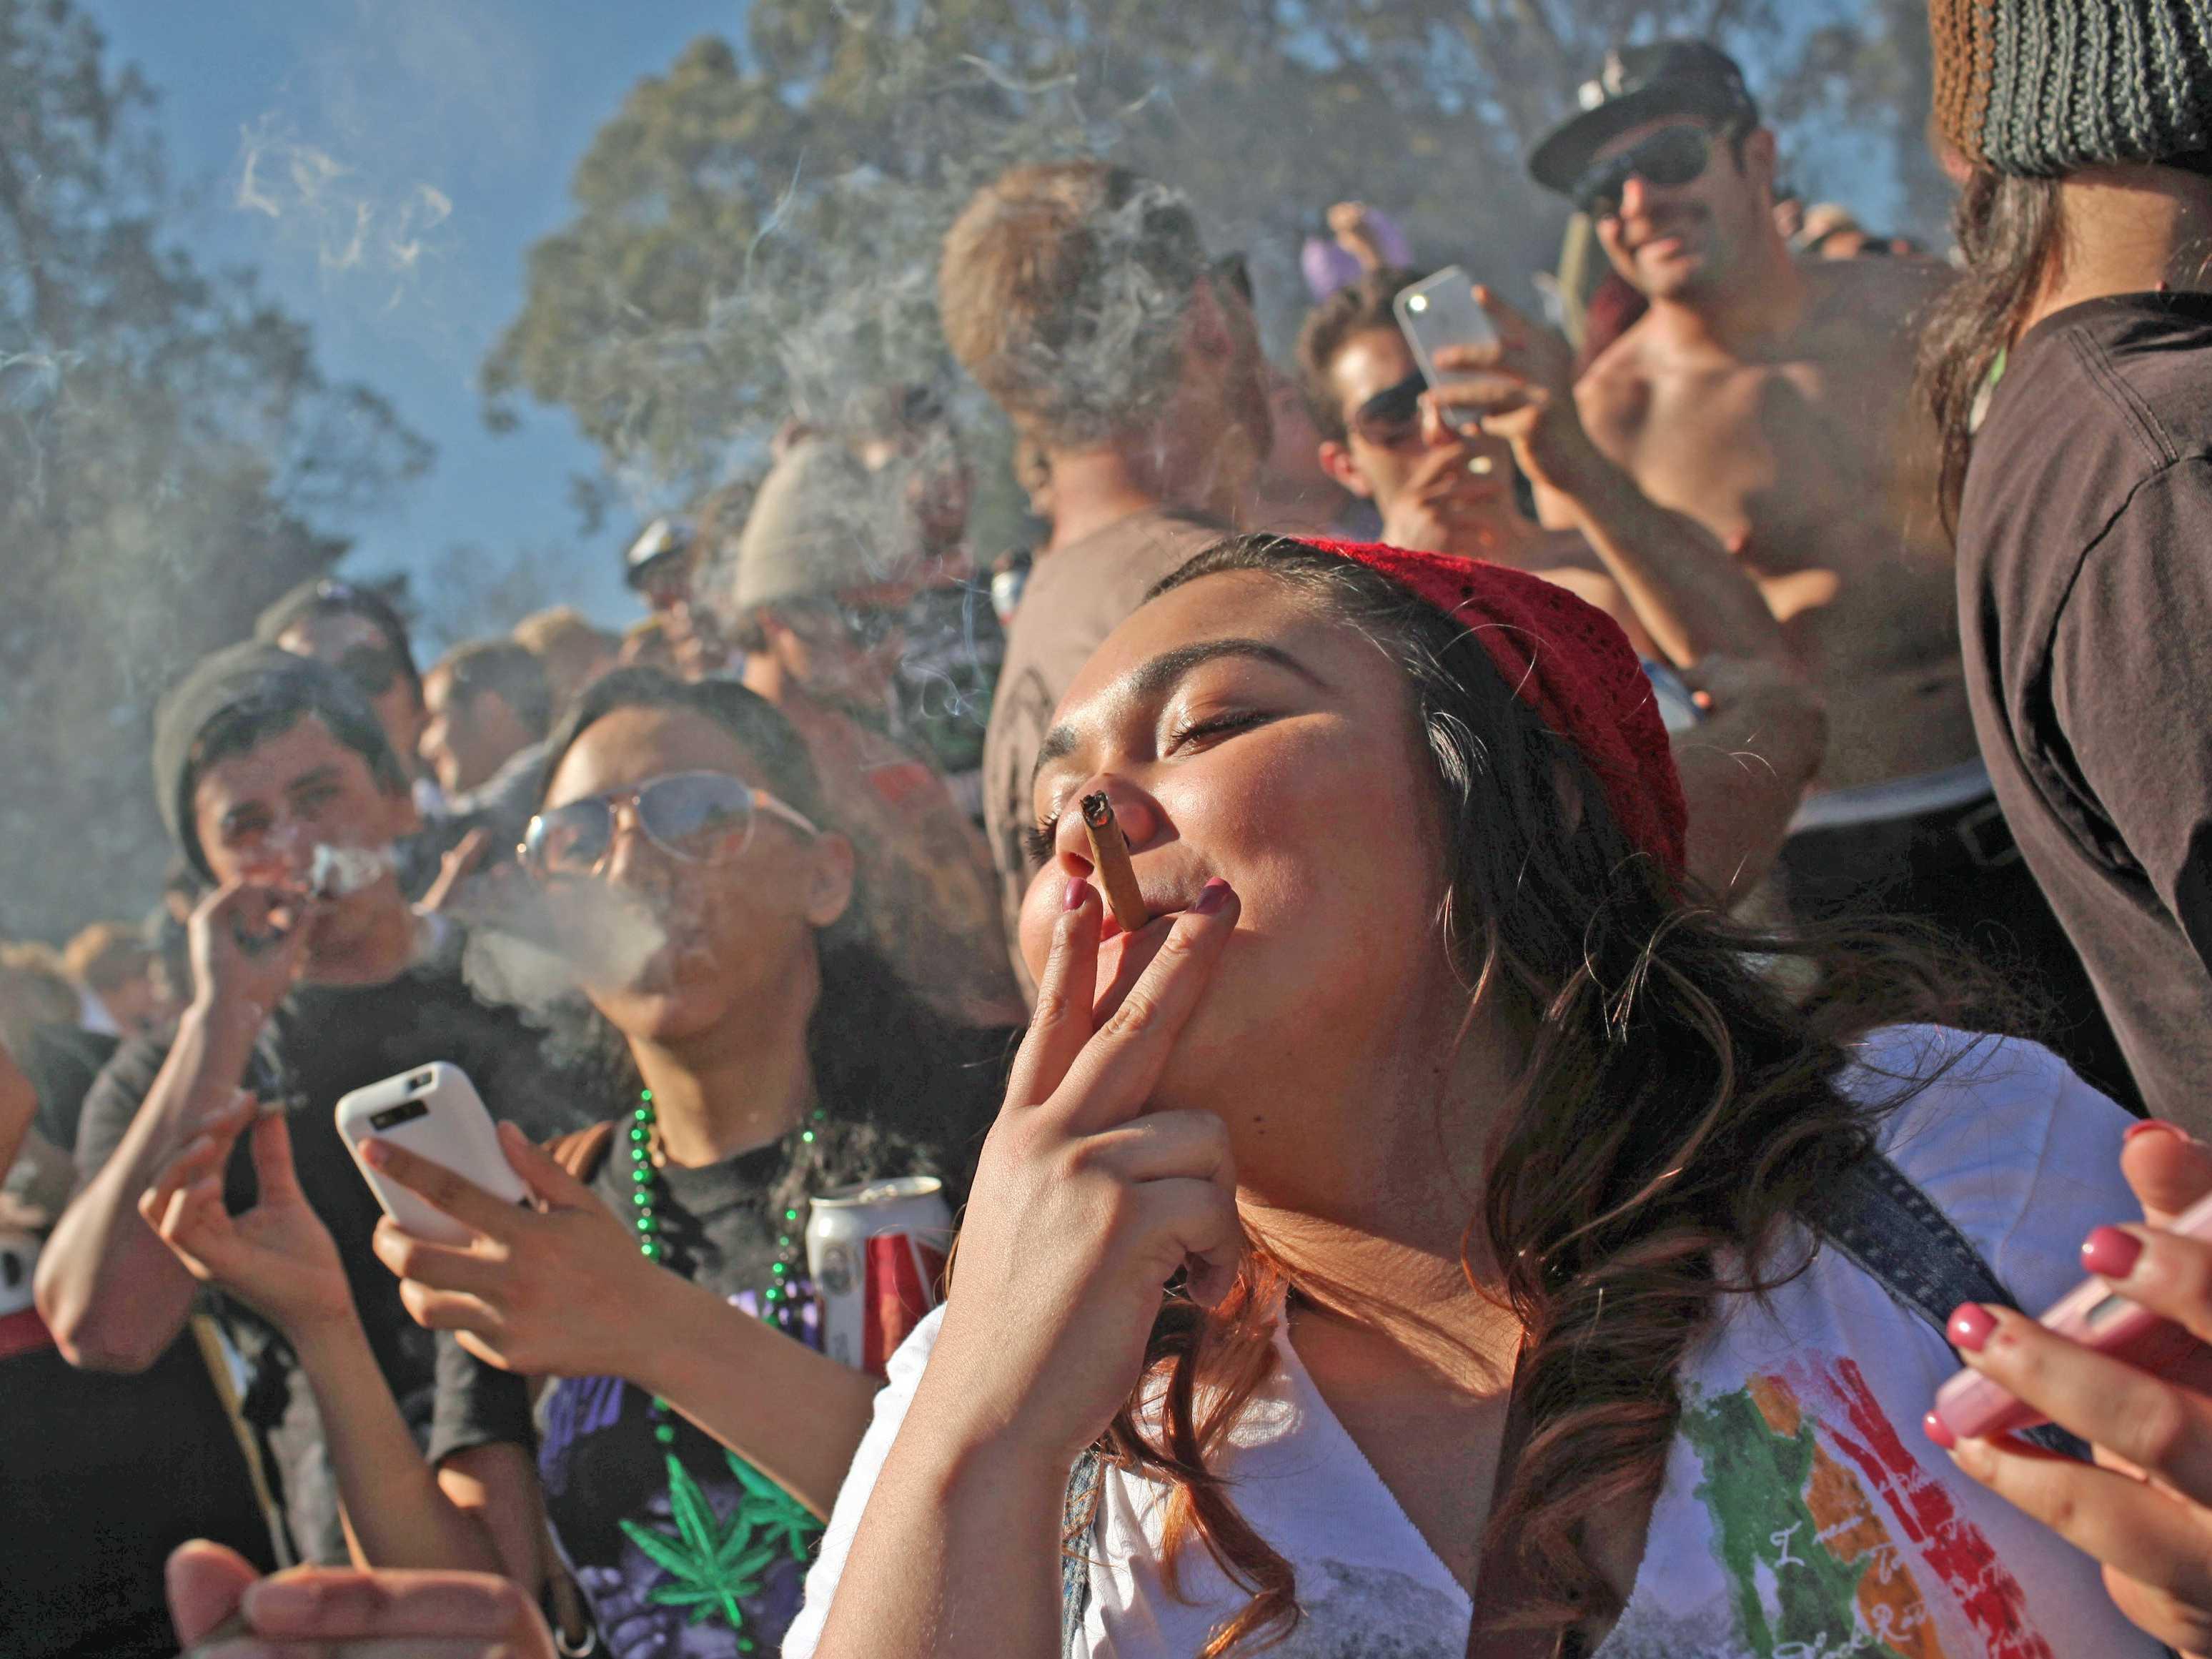 Colorado refuerza programas para prevenir uso de sustancias prohibidas